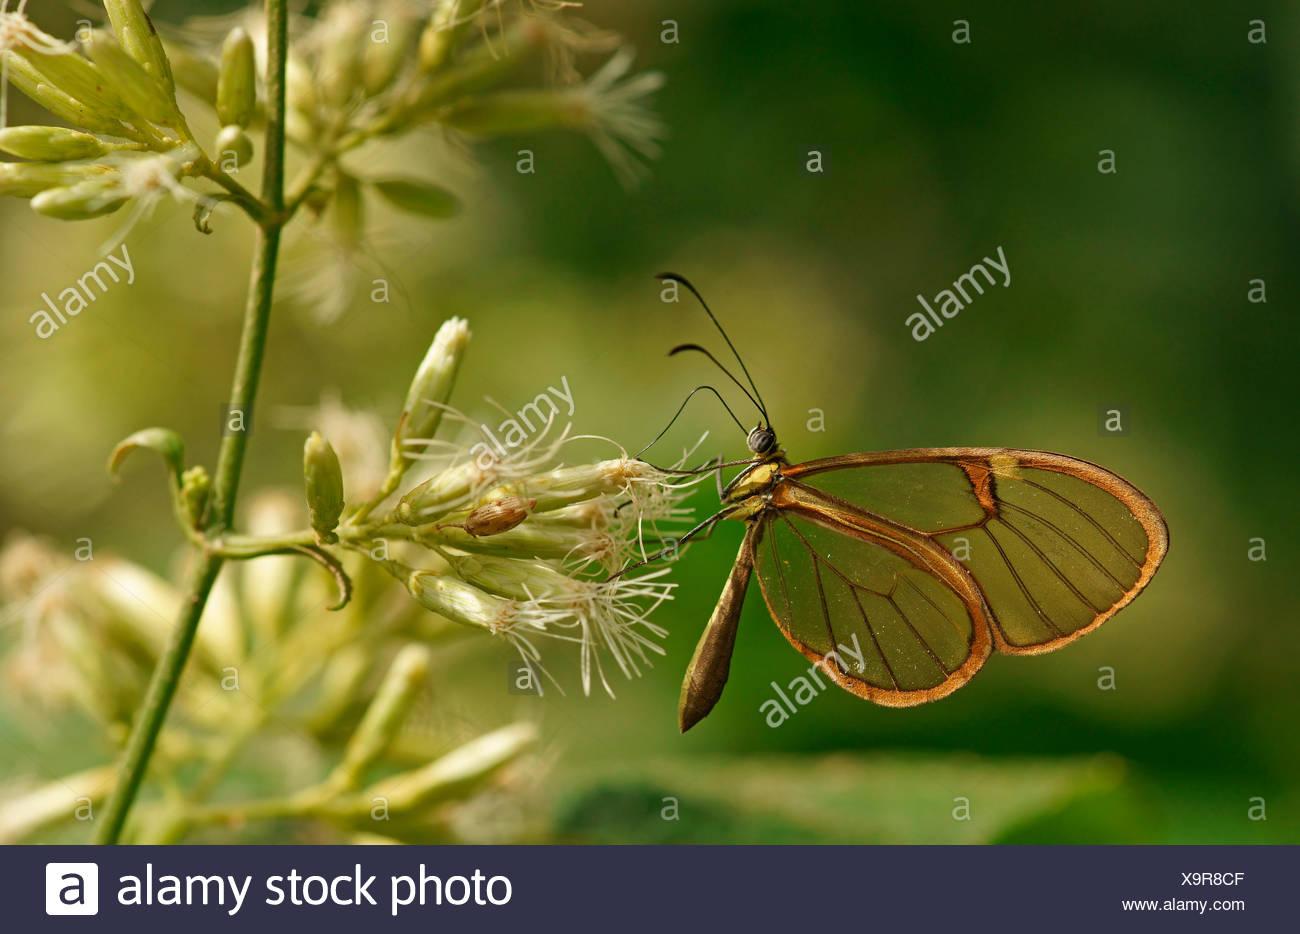 Clearwing, Tropischer Schmetterling (Hypoleria Lavinia), Iguazú Nationalpark, Paraná, Brasilien Stockbild